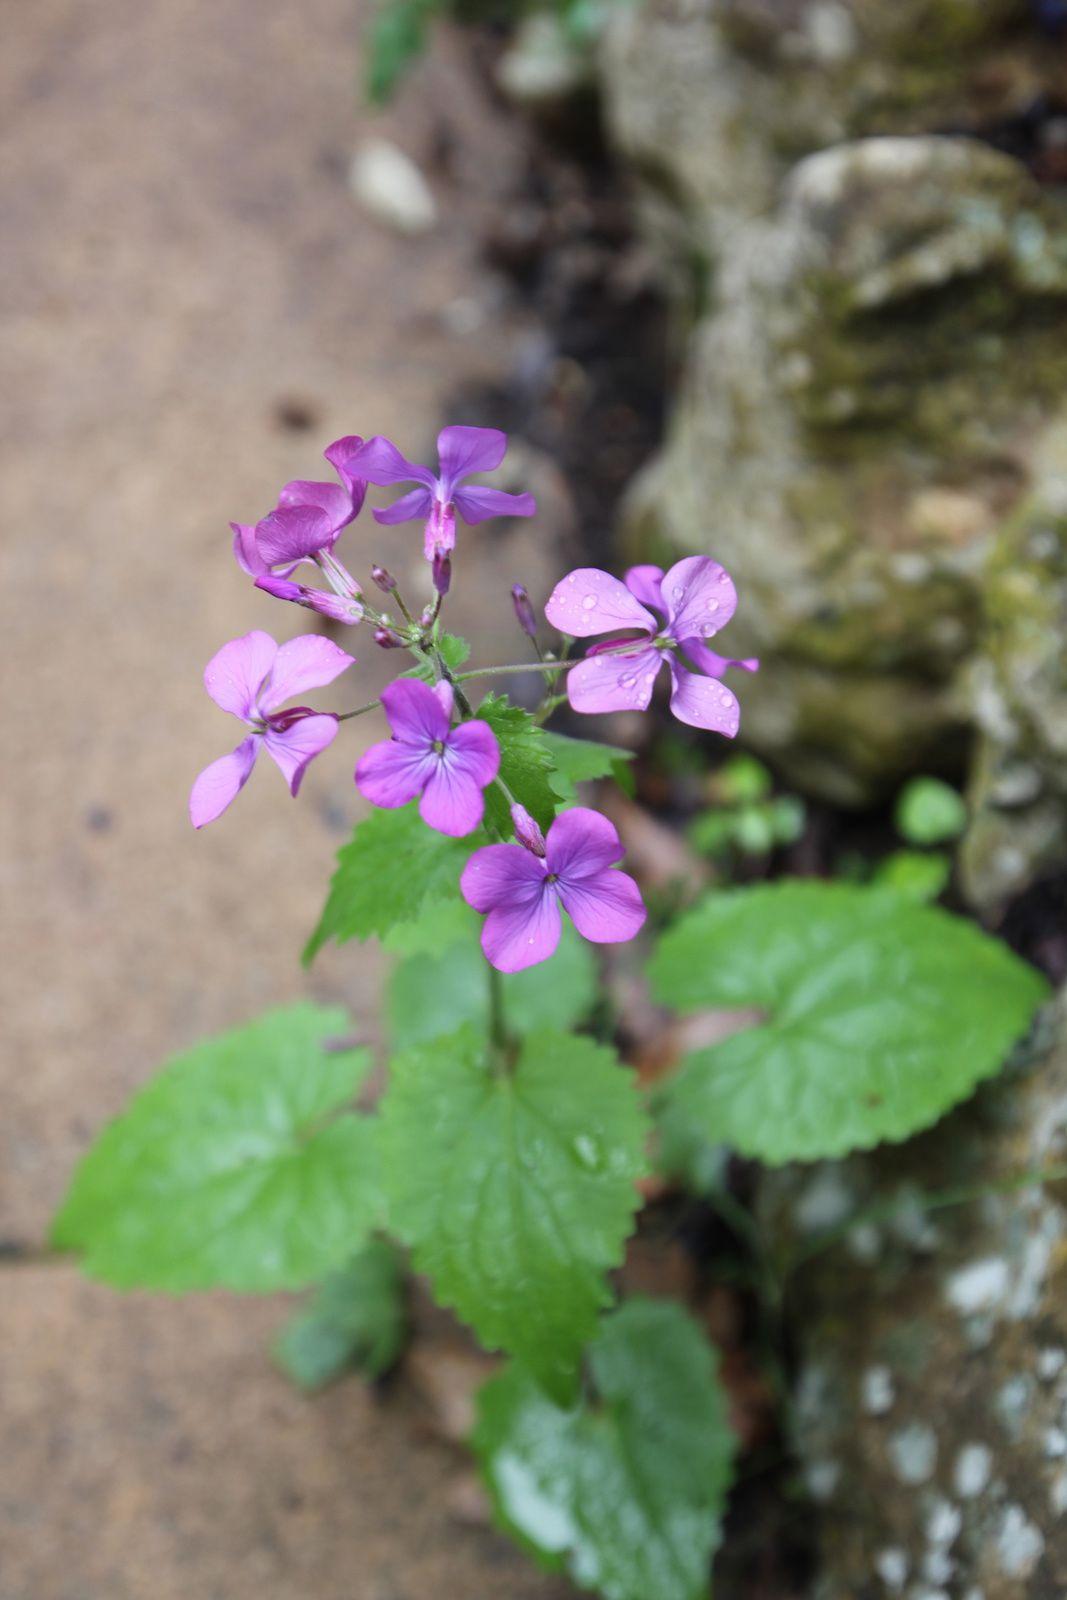 Fleurs du printemps, en mon jardin...